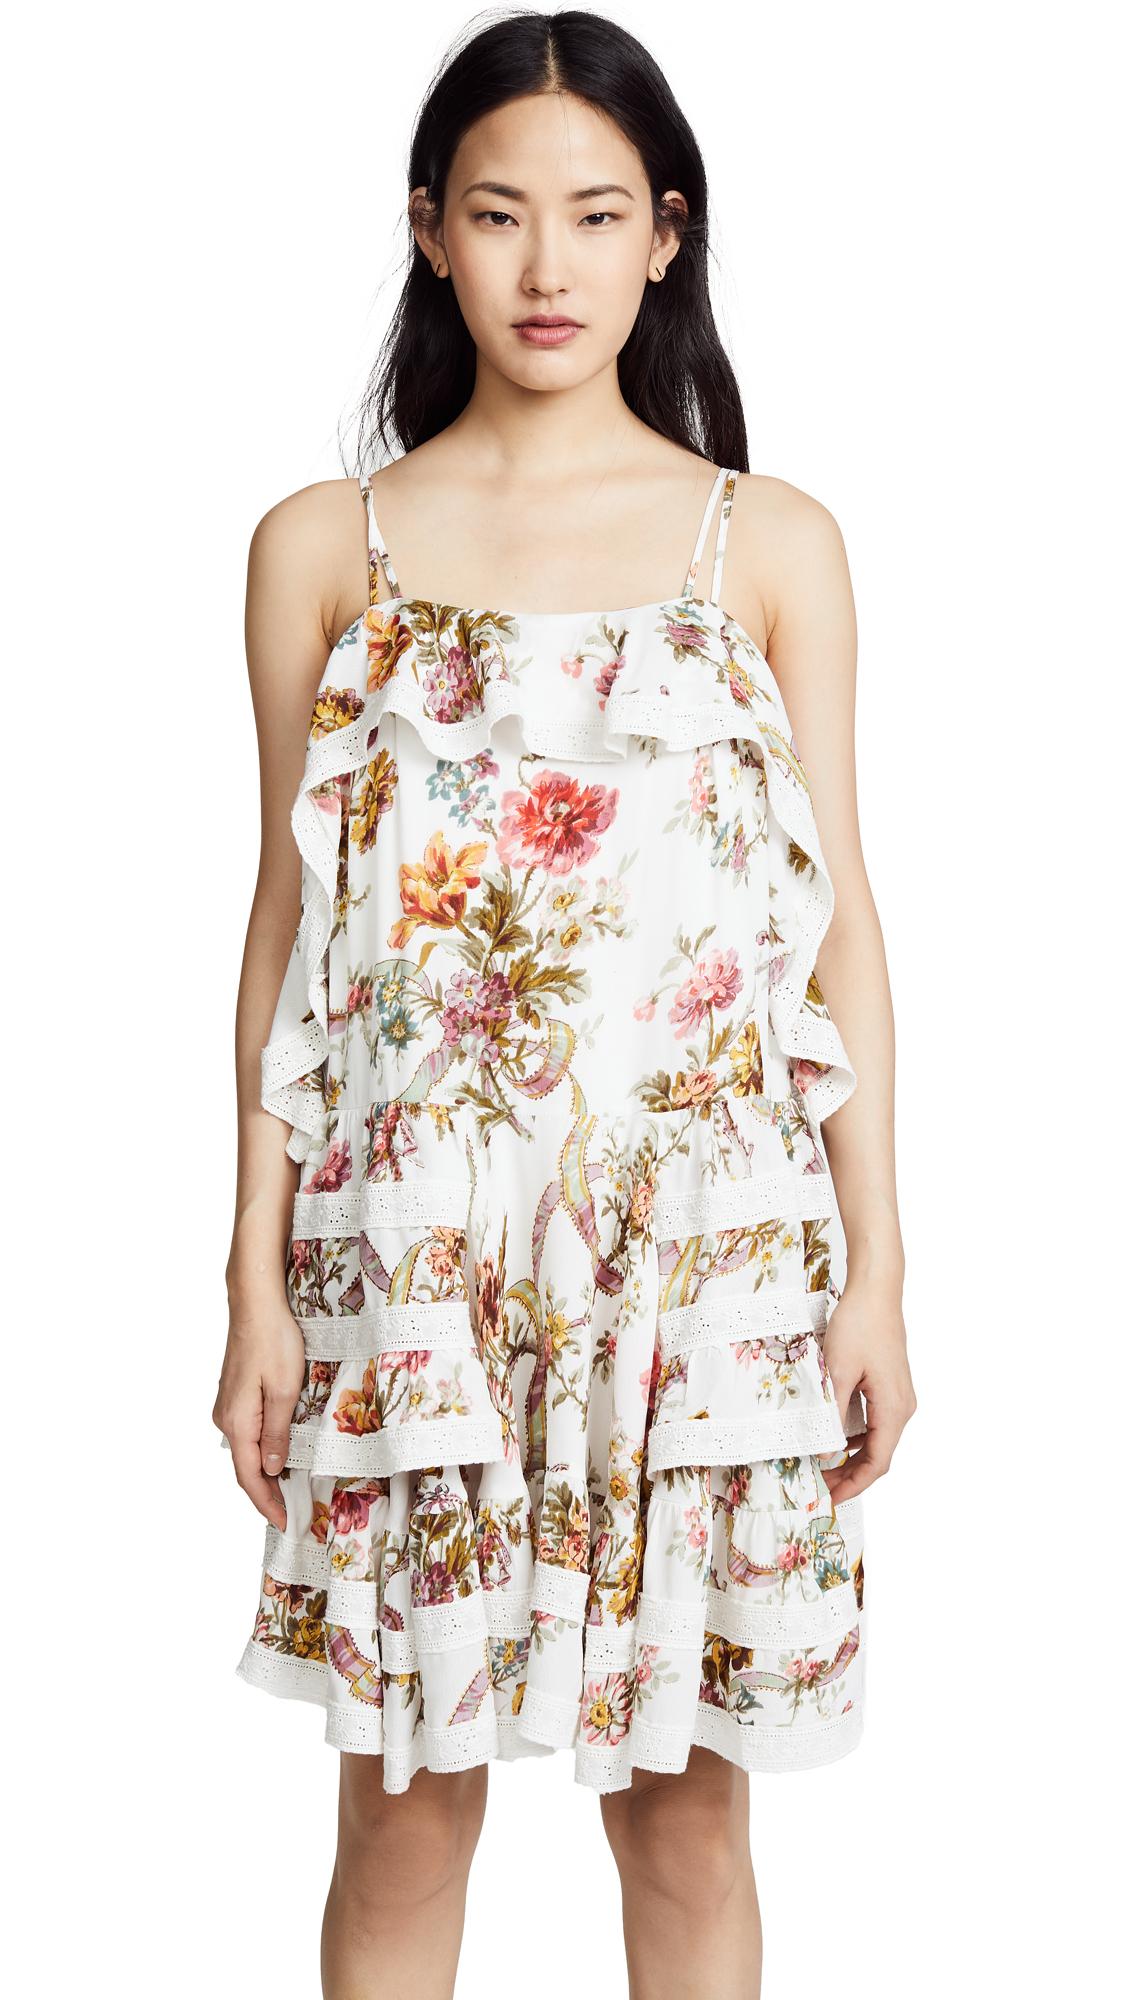 Needle & Thread Rainbow Rose Ruffle Dress In Ivory